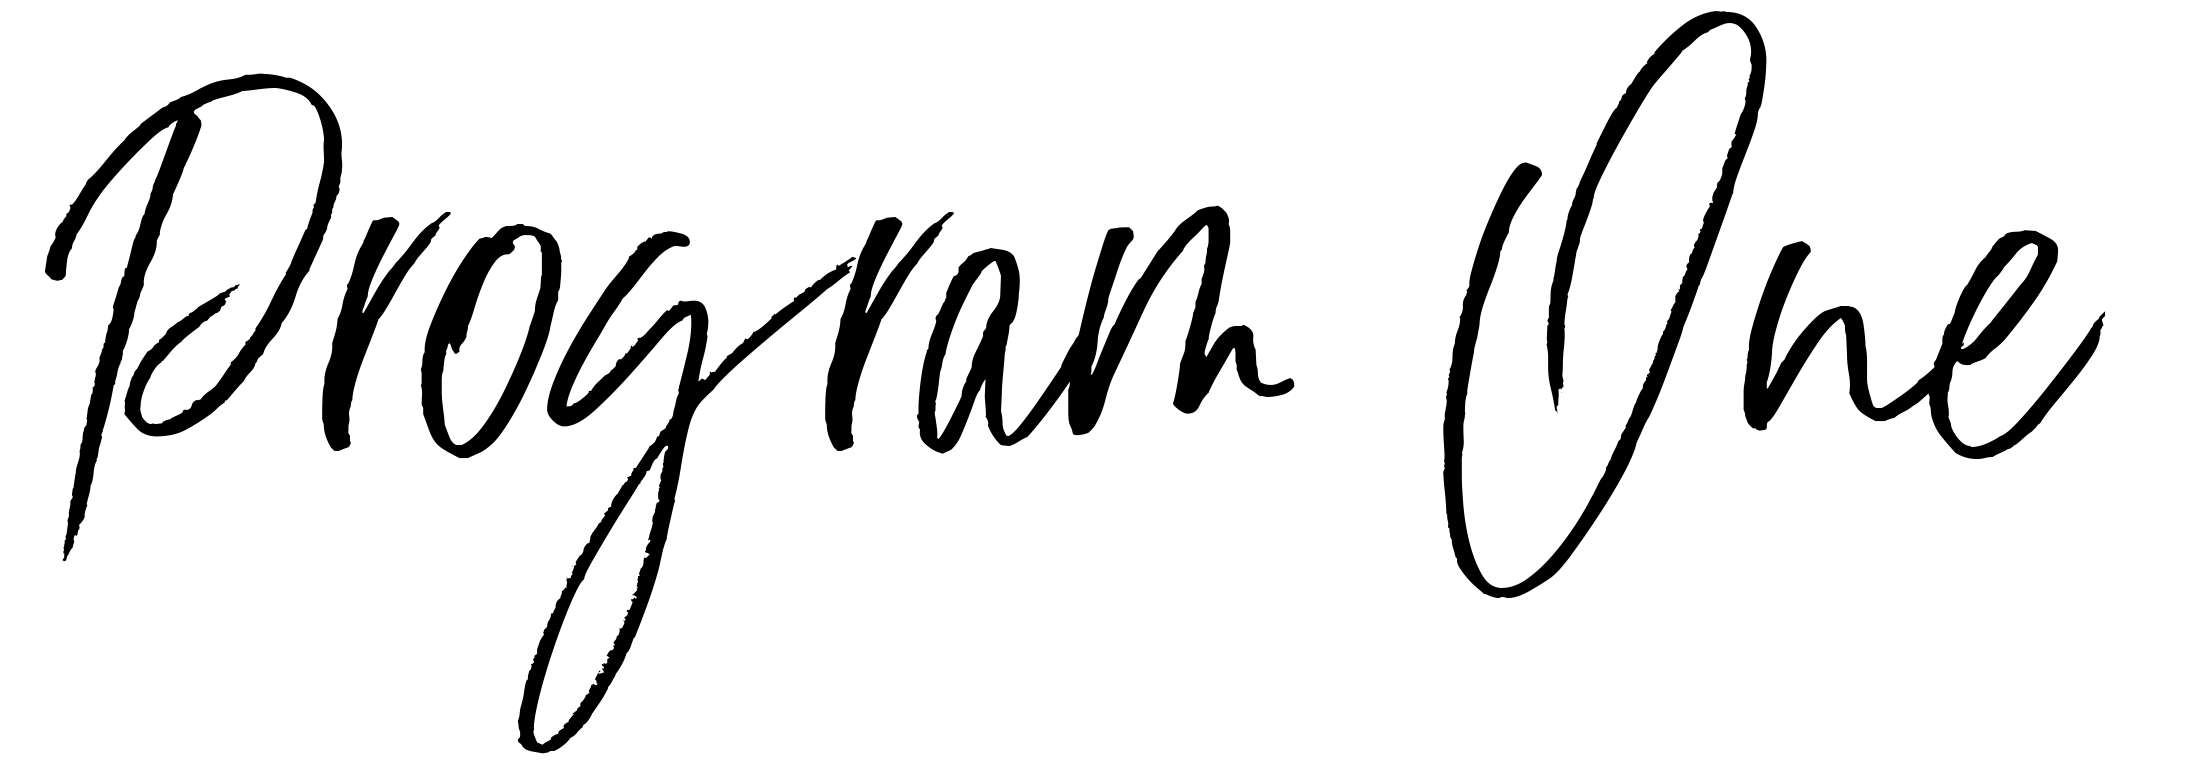 Program-1.png